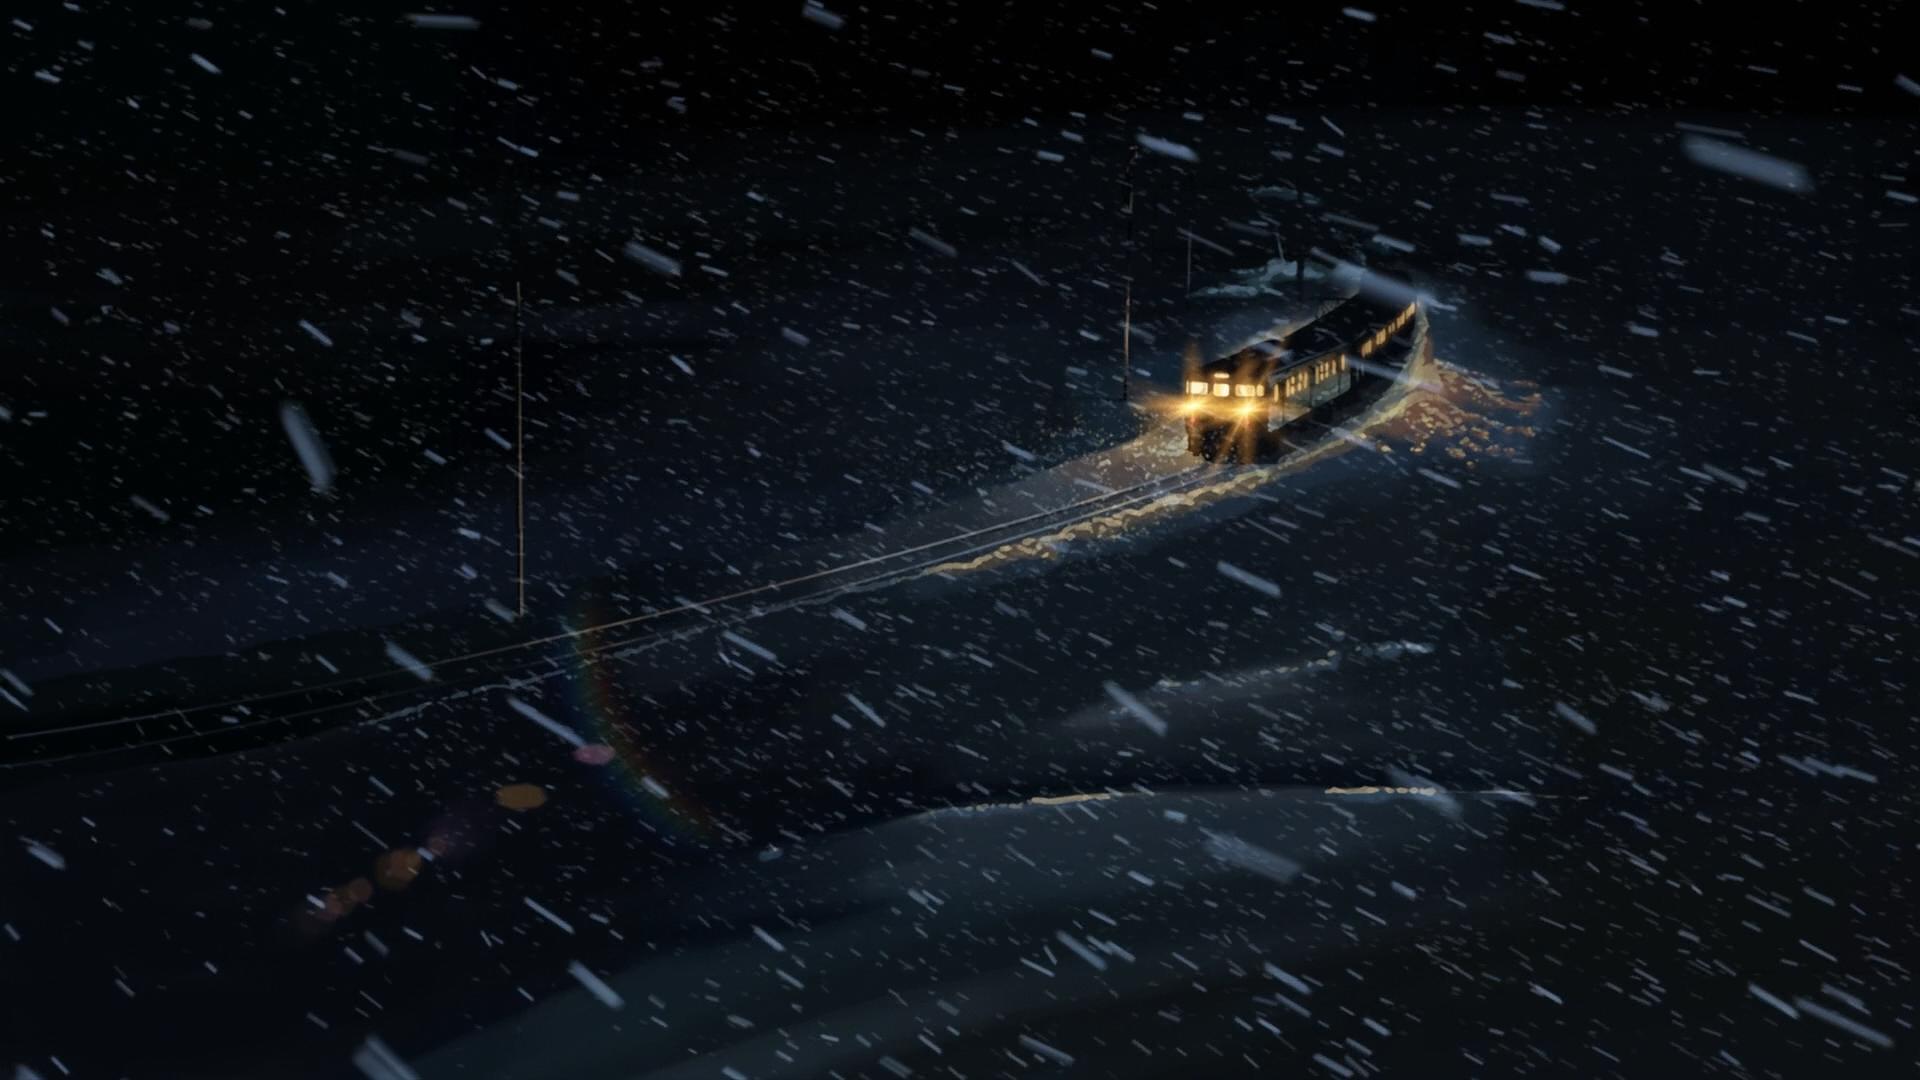 anime winter night 5 centimeters per second train snow lights